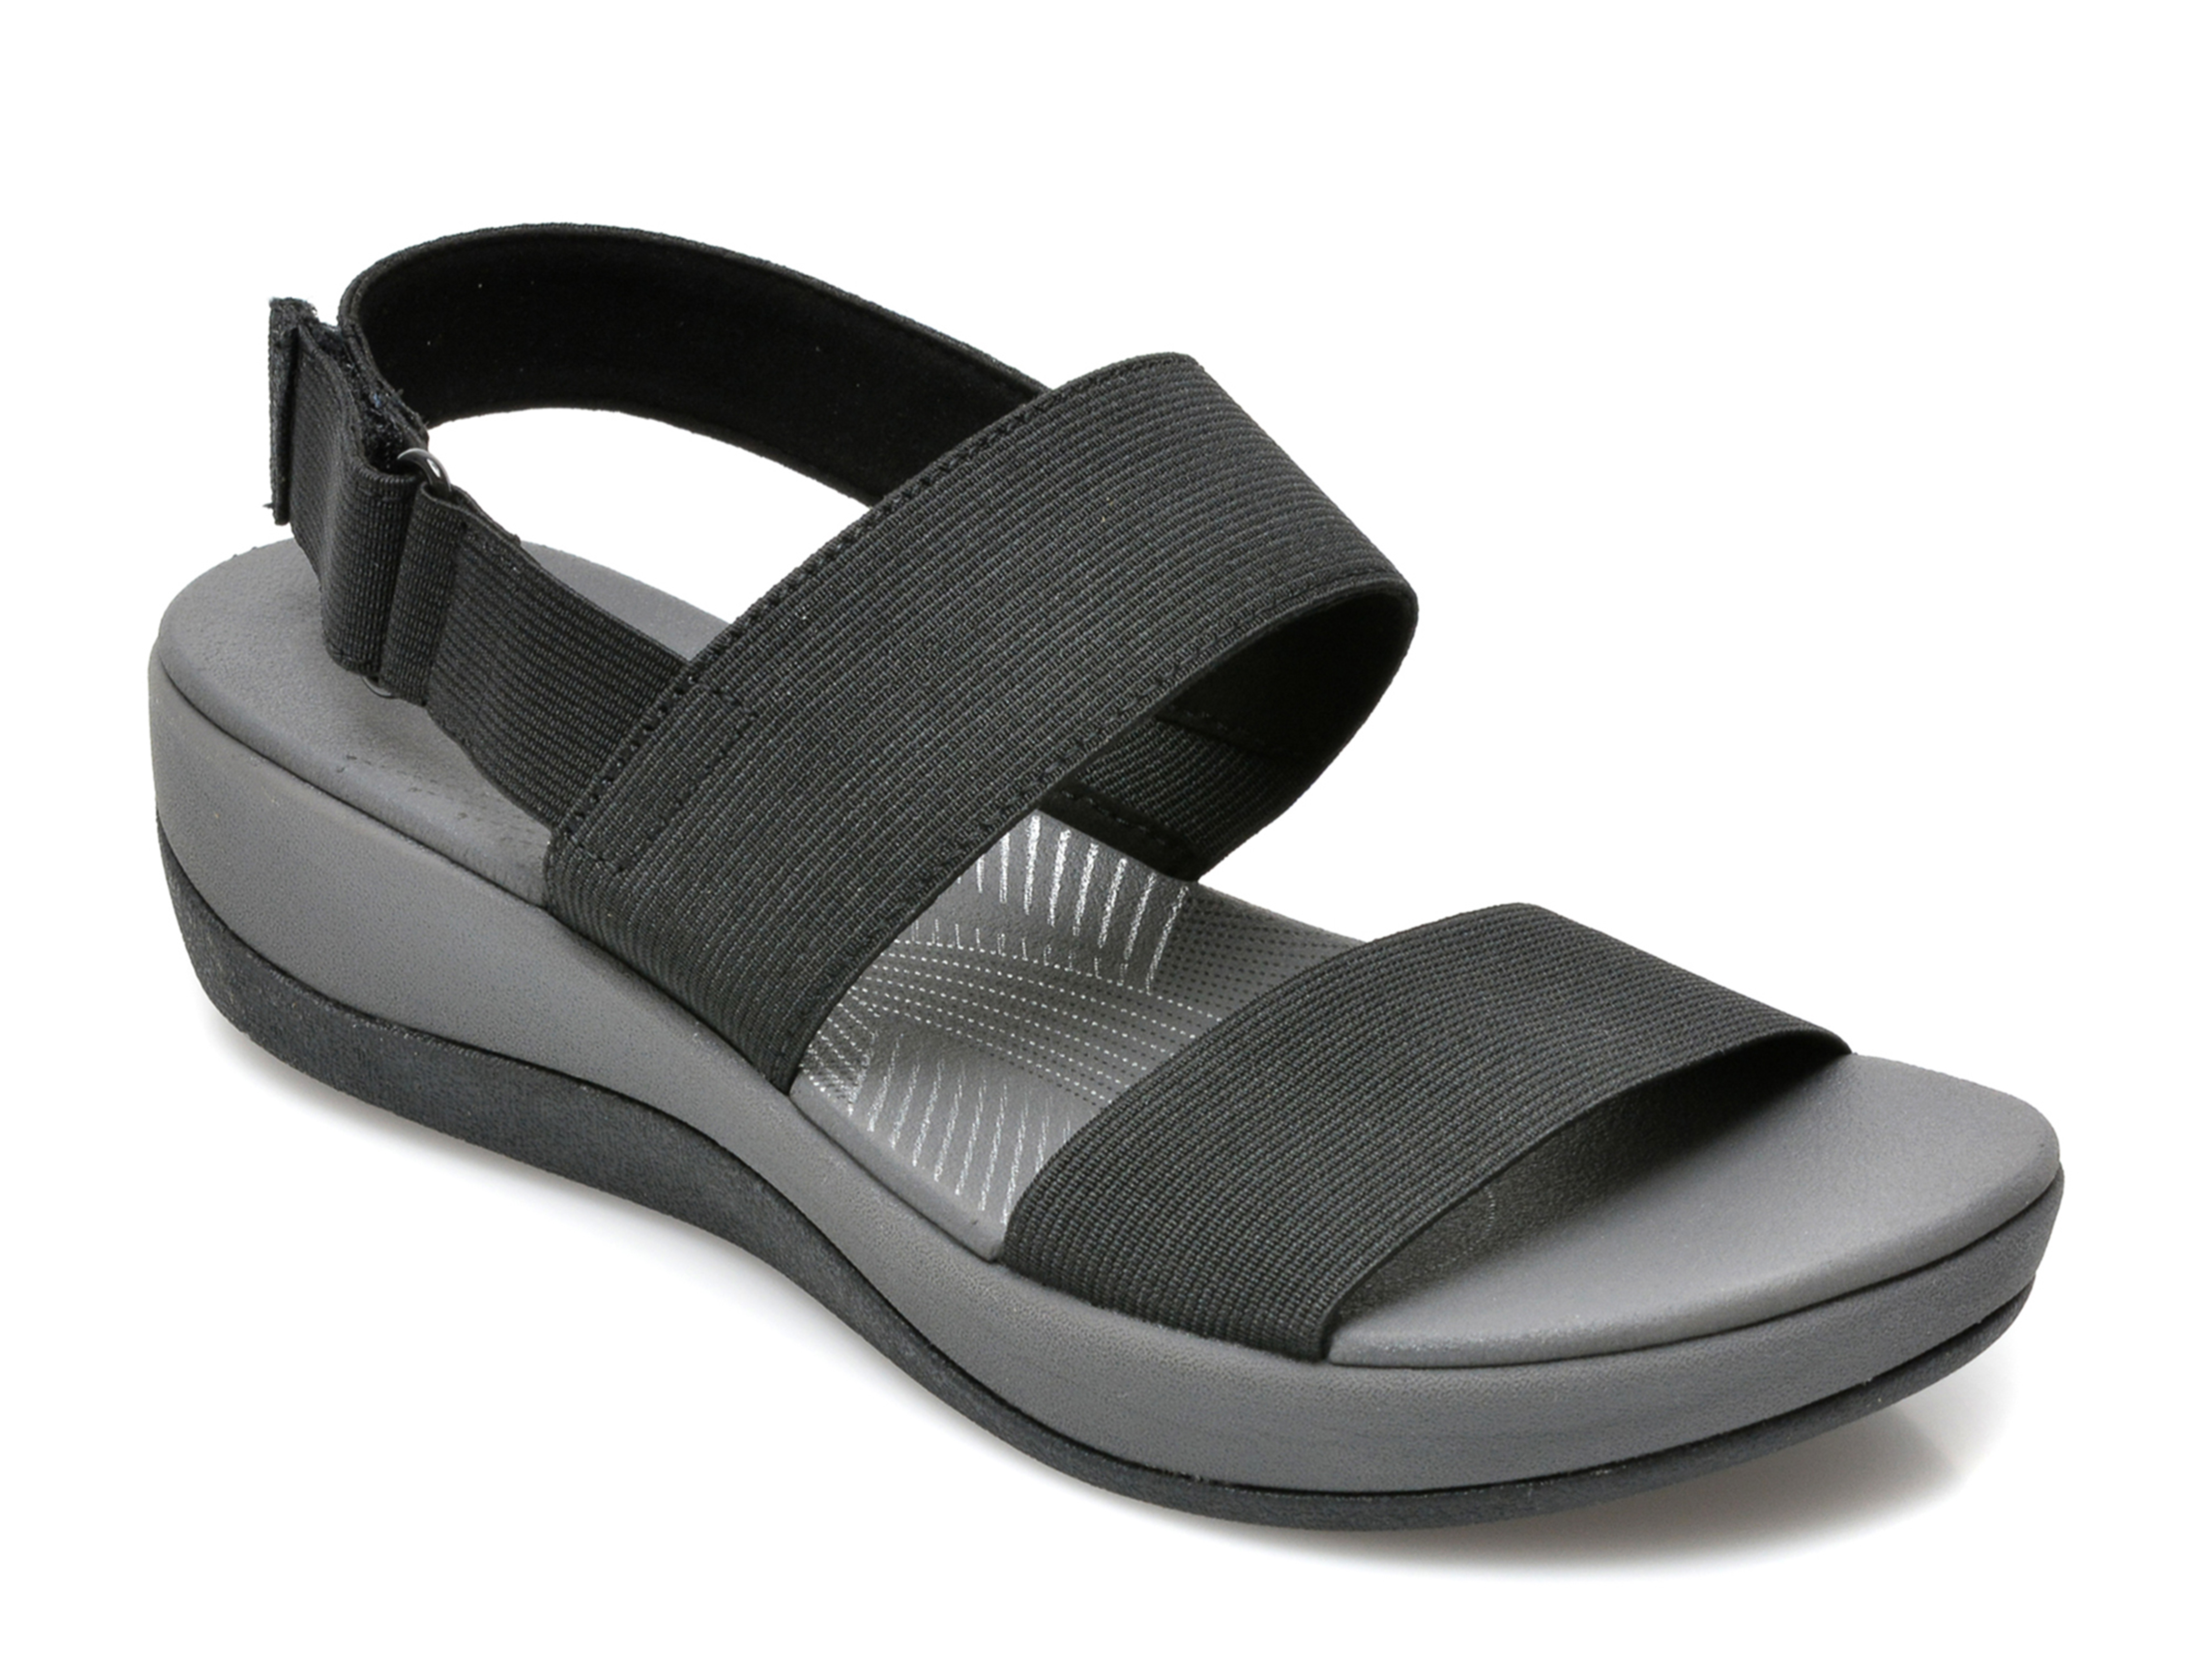 Sandale CLARKS negre, Arla Jacory, din piele ecologica imagine otter.ro 2021